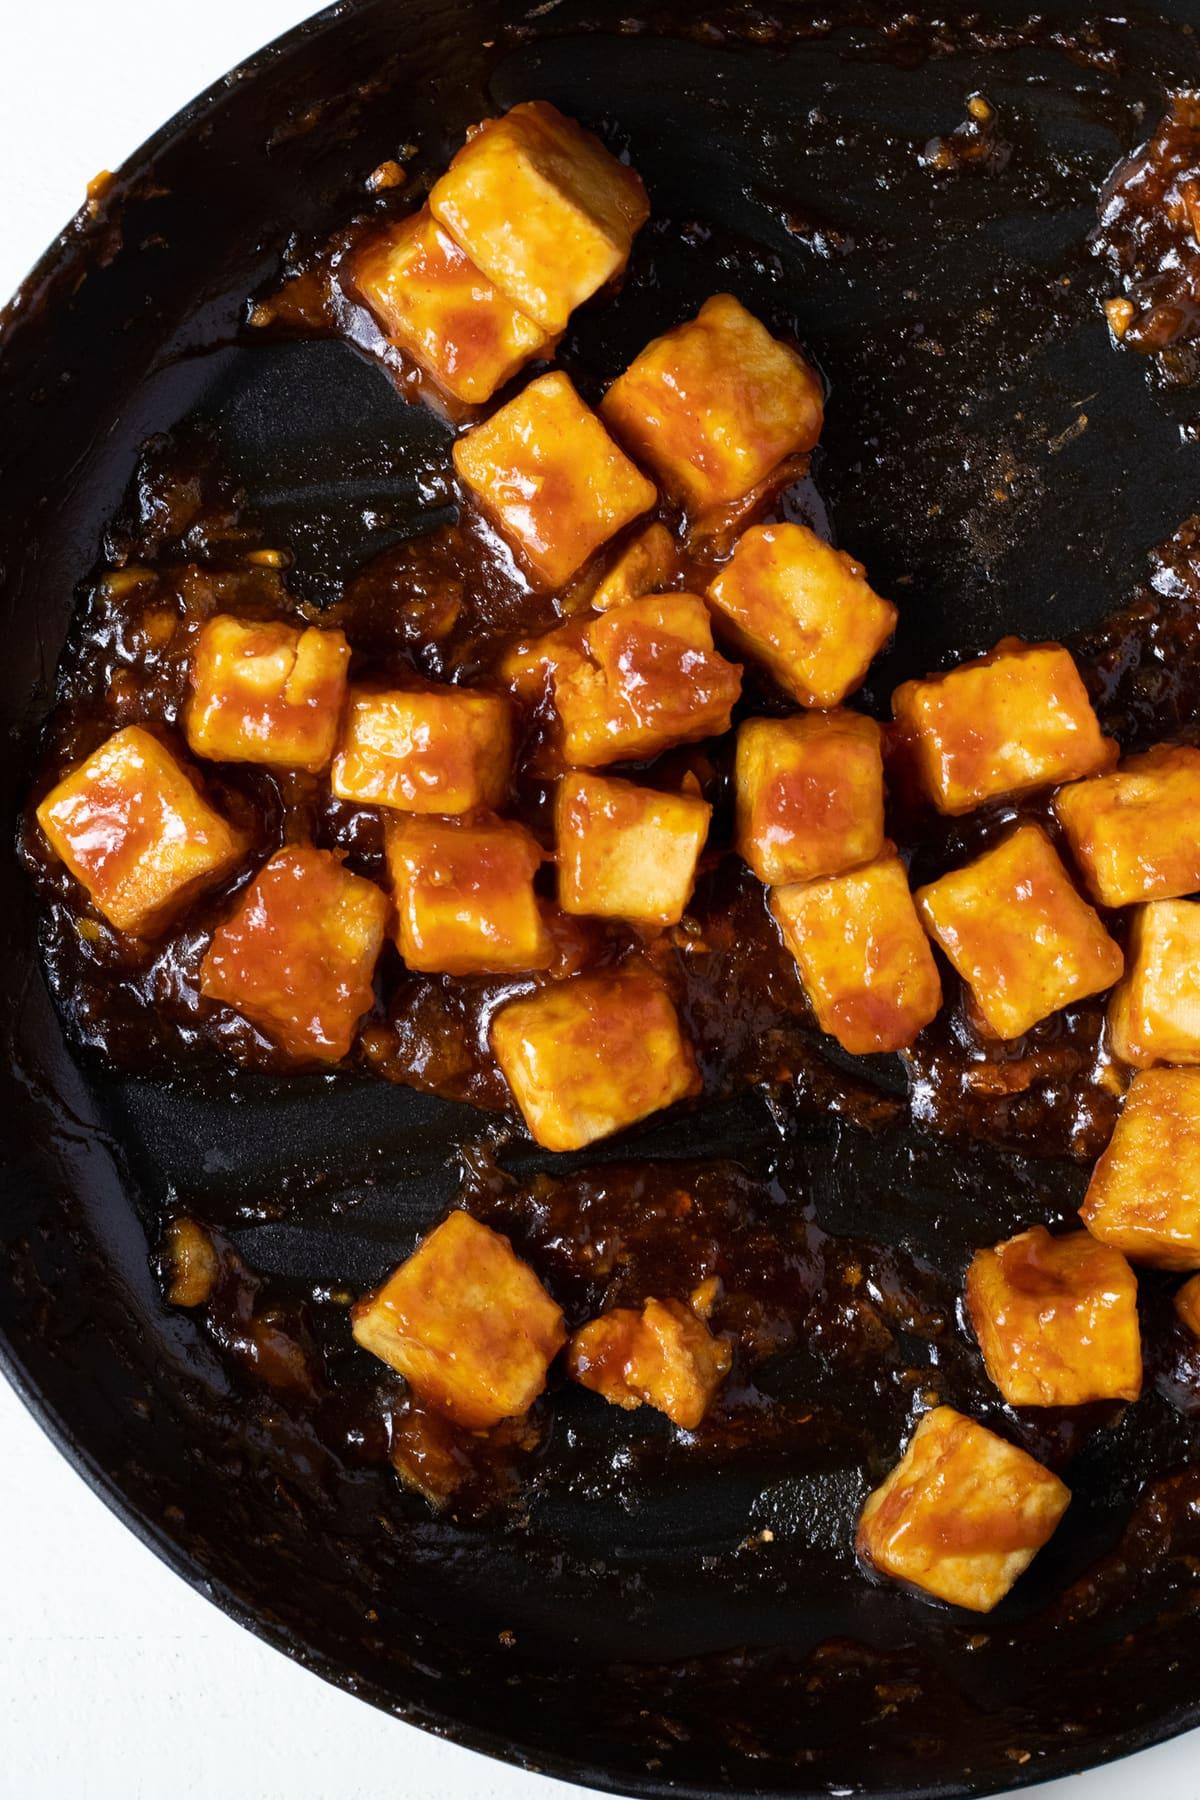 Tofu cubes in orange sauce glaze in cast iron skillet